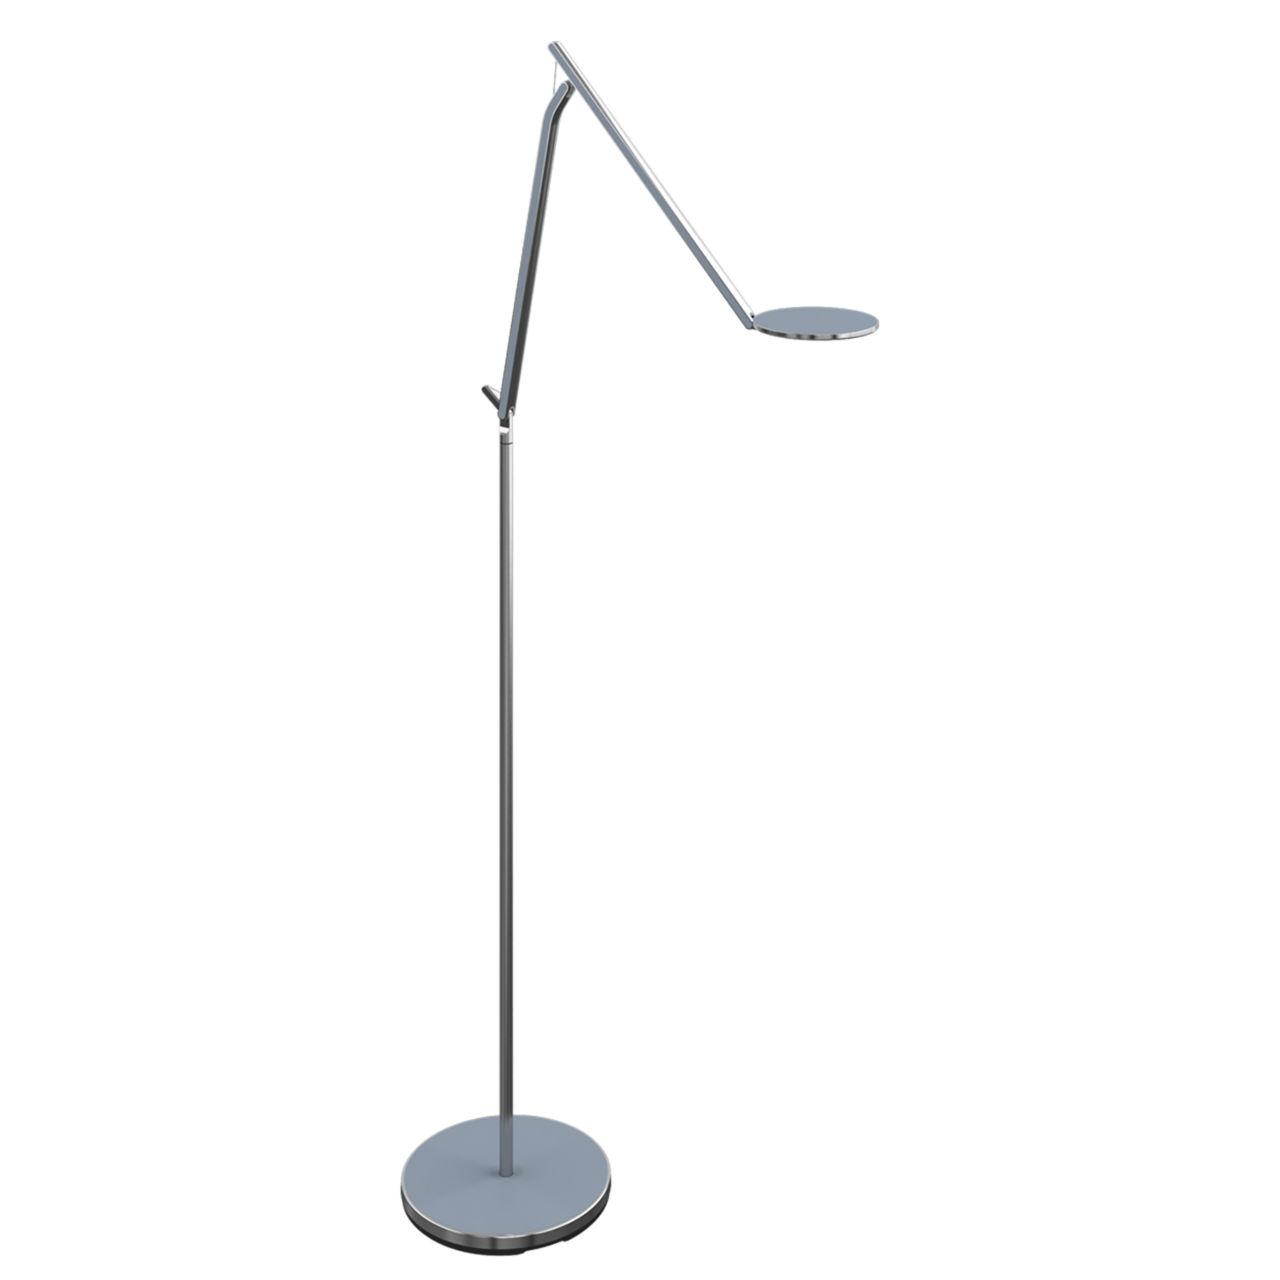 Infinity Floor Lamp in Slate Blue Semi Matte by Humanscale